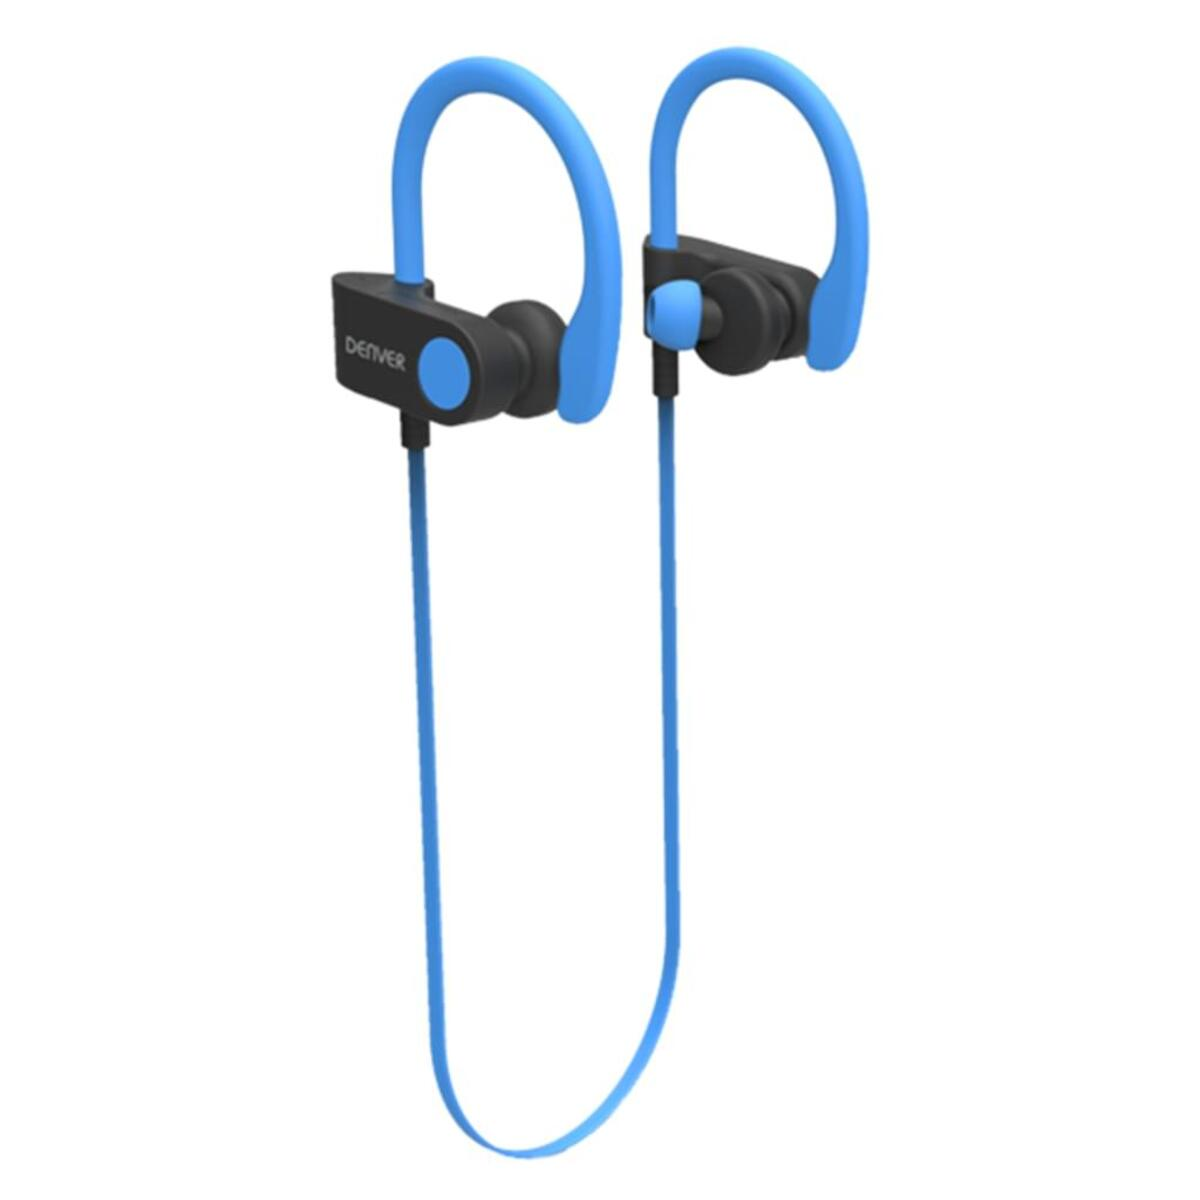 Bild 1 von Bluetooth Kopfhörer Sport Denver Electronics BTE-110 50 mAh